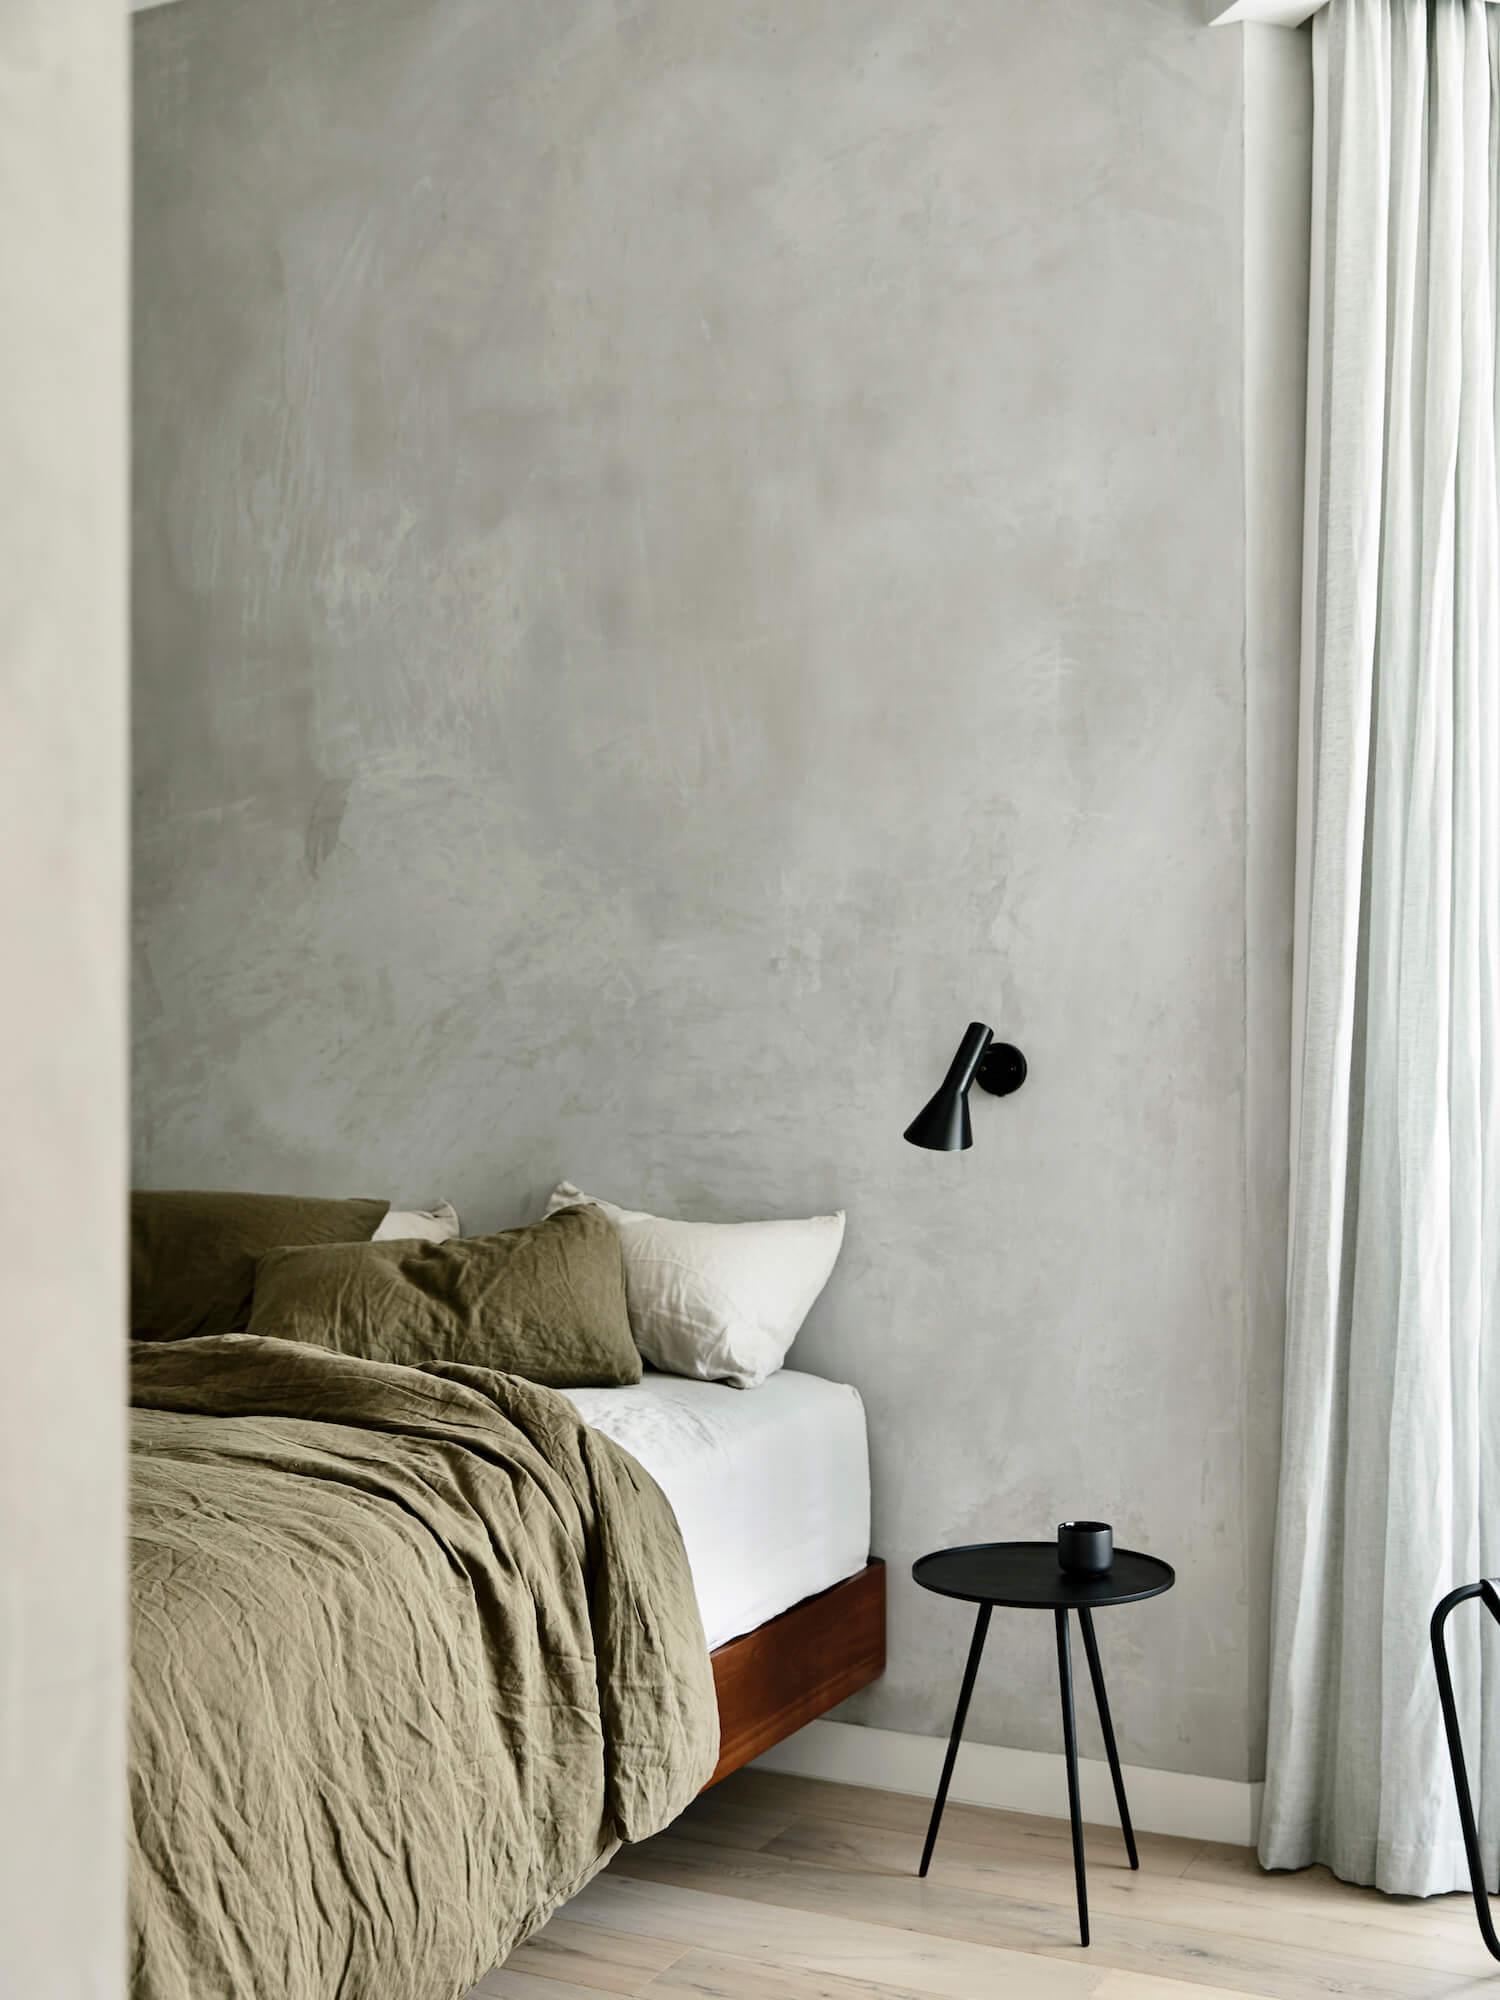 est living york street residence jackson clements burrows architects brickworks 8